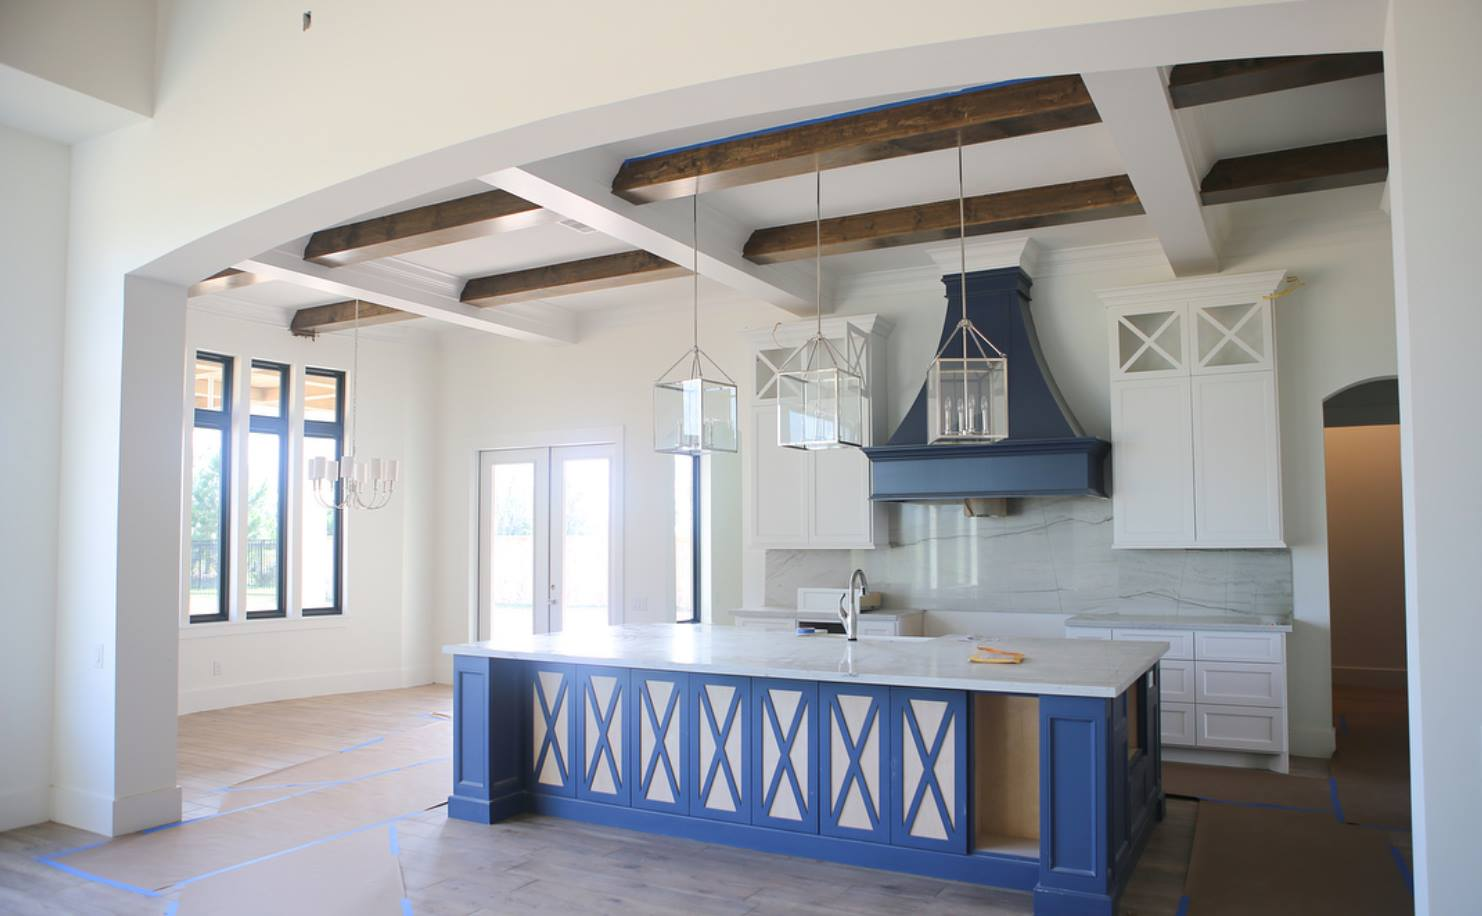 Beth Lindsay Interior Design; Benjamin Moore Van Duesen Blue and Shermin Williams Pure White.